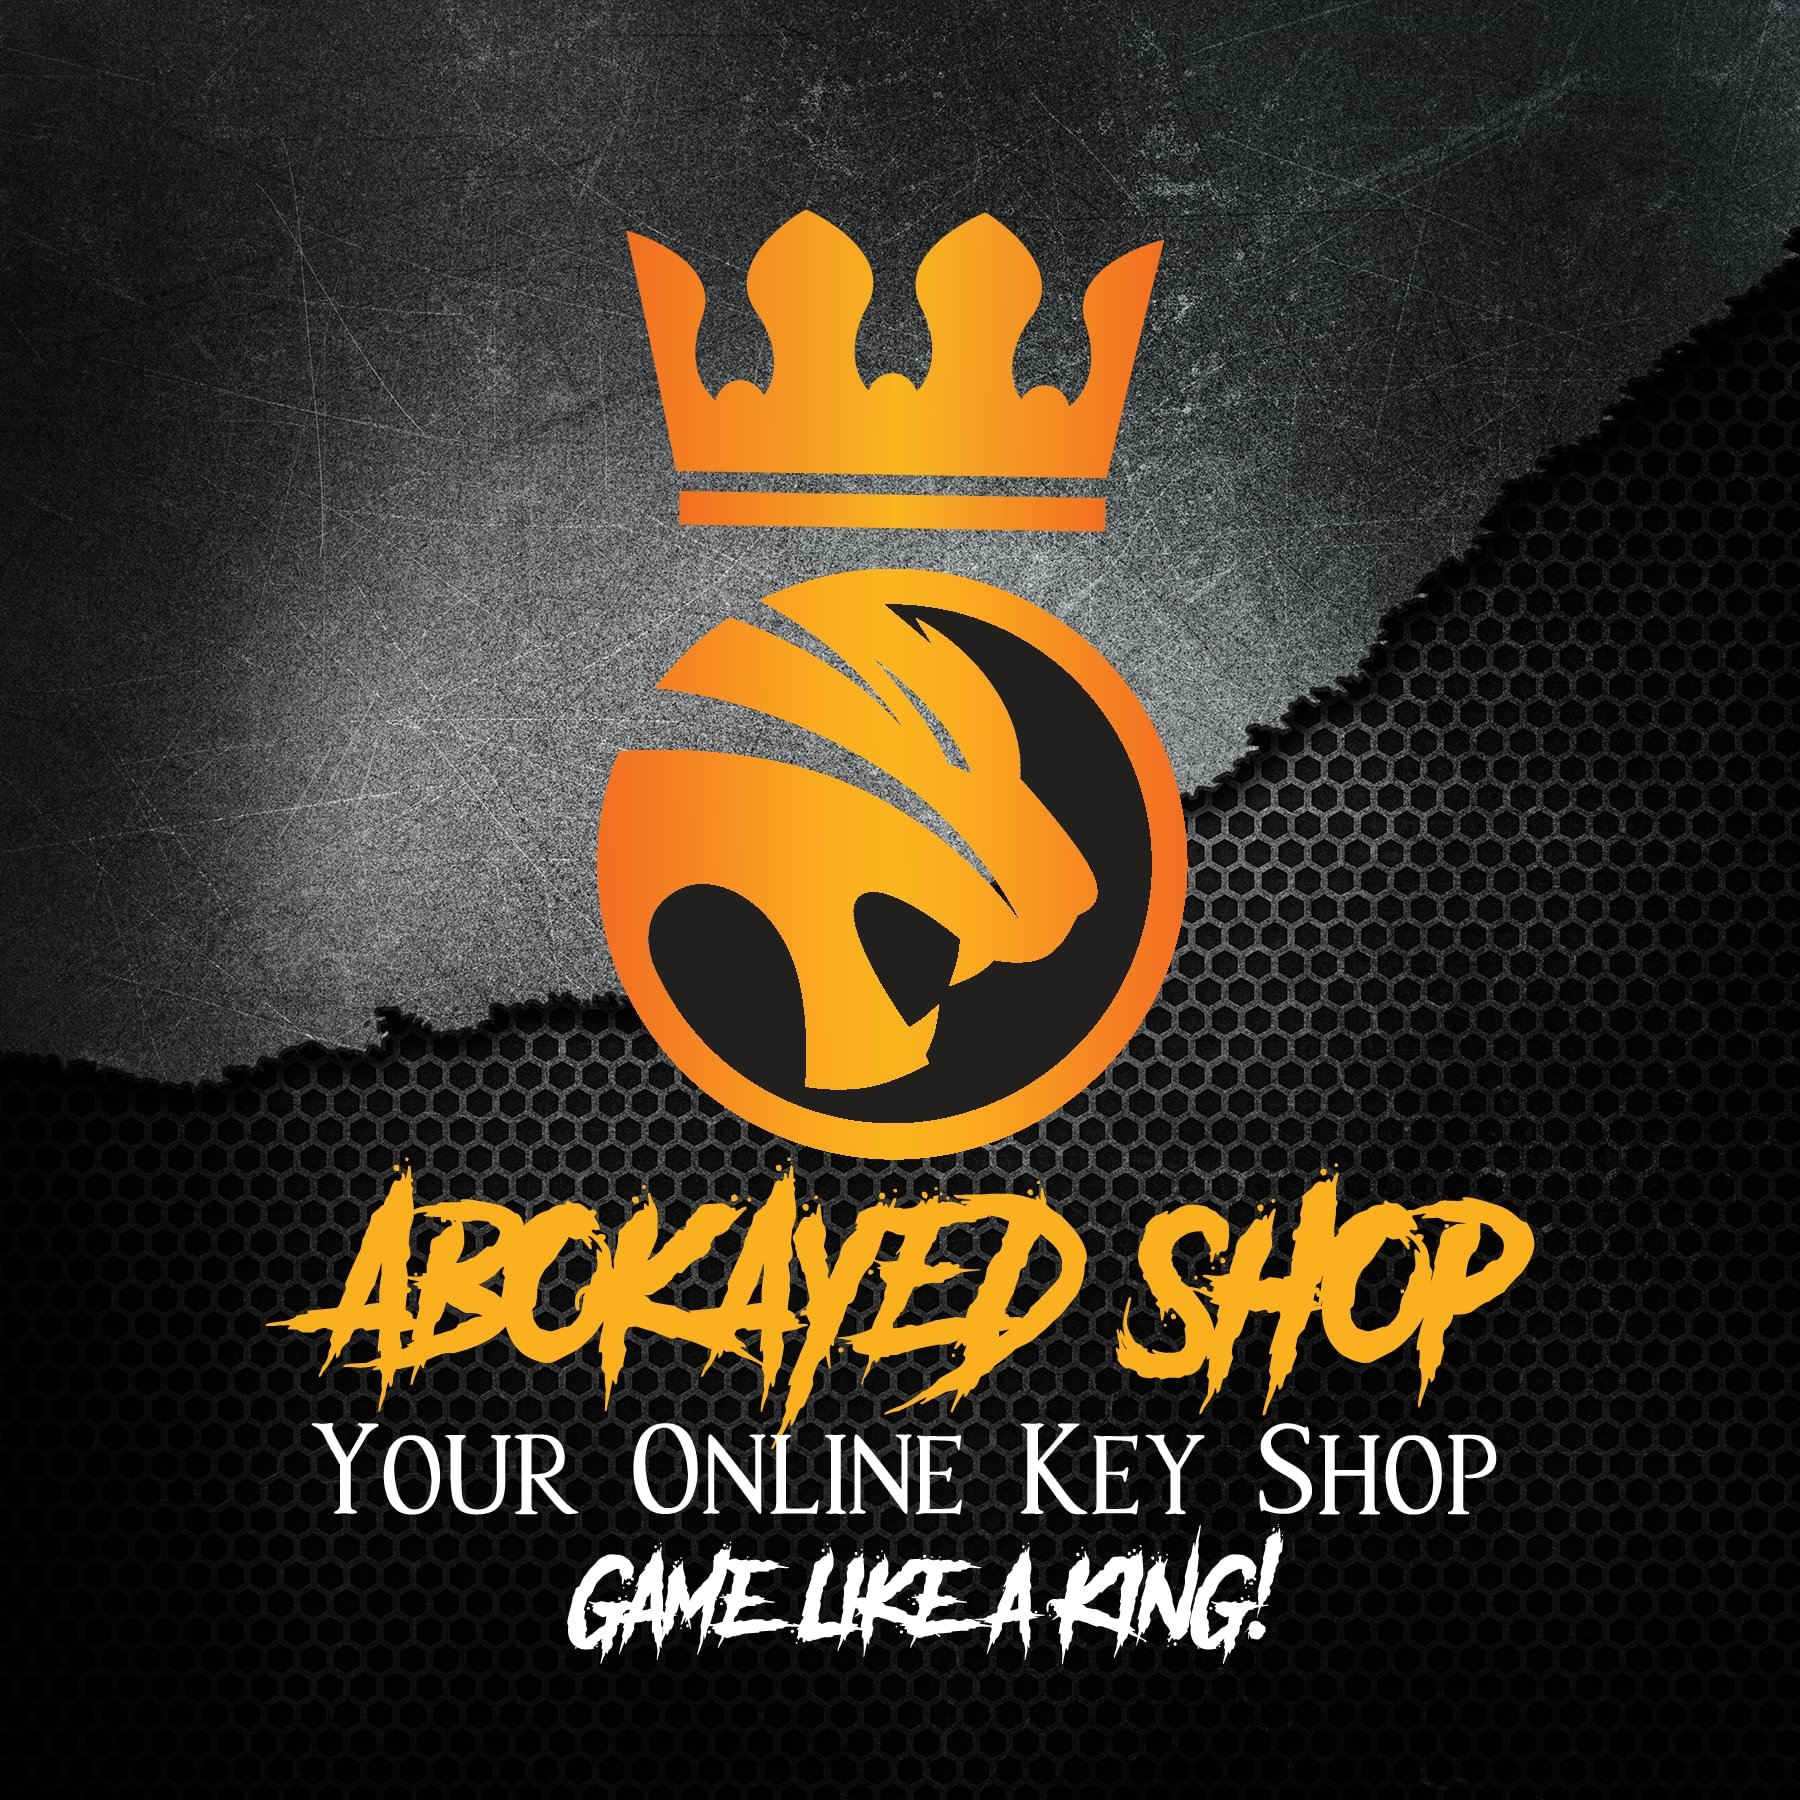 AboKayedShop